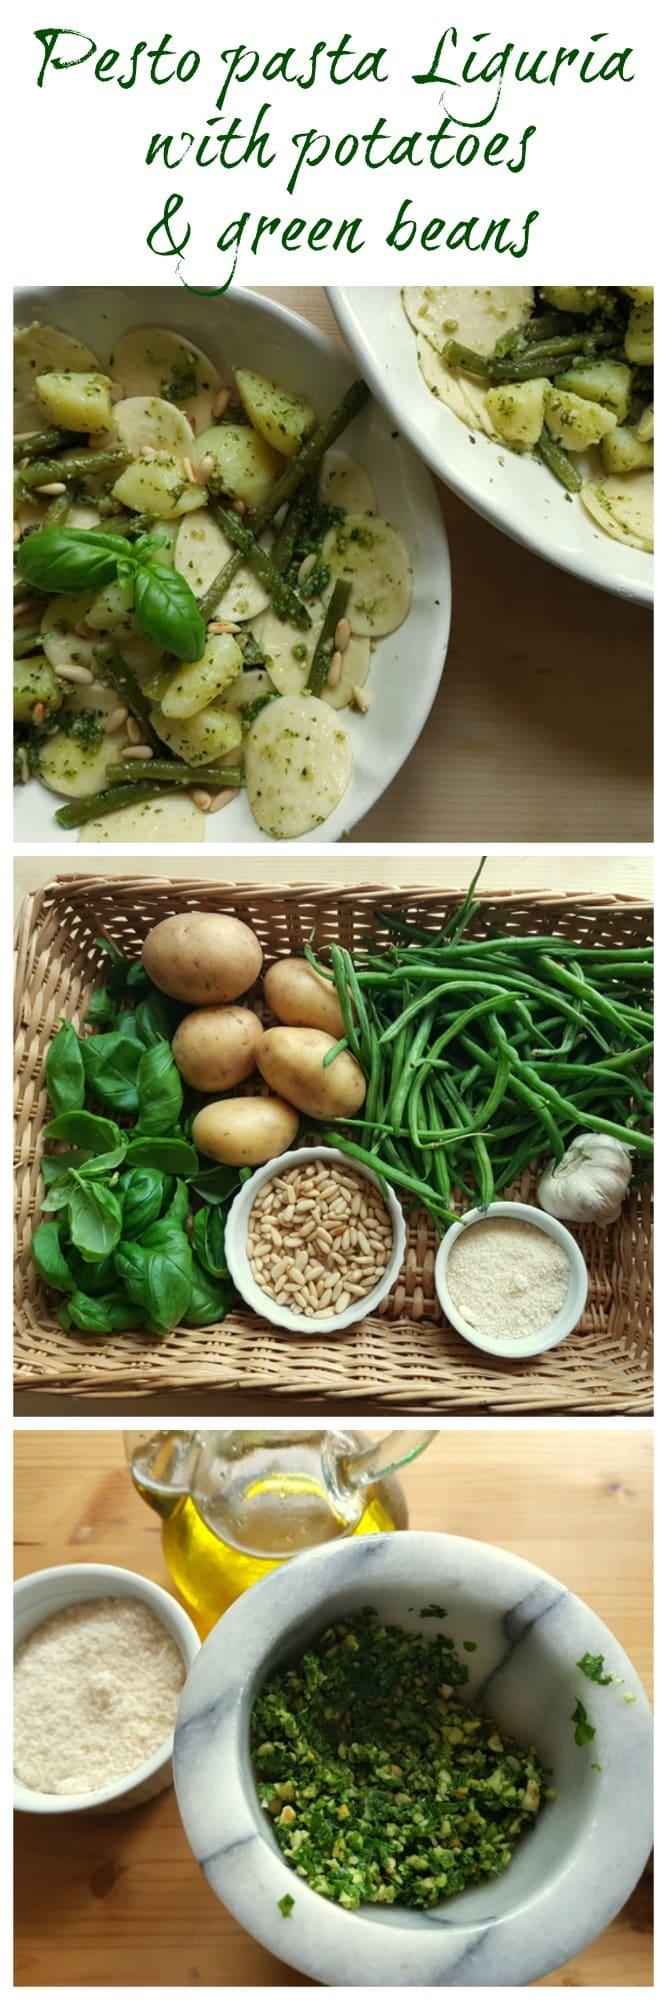 corzetti pesto pasta Liguria with potatoes and green beans